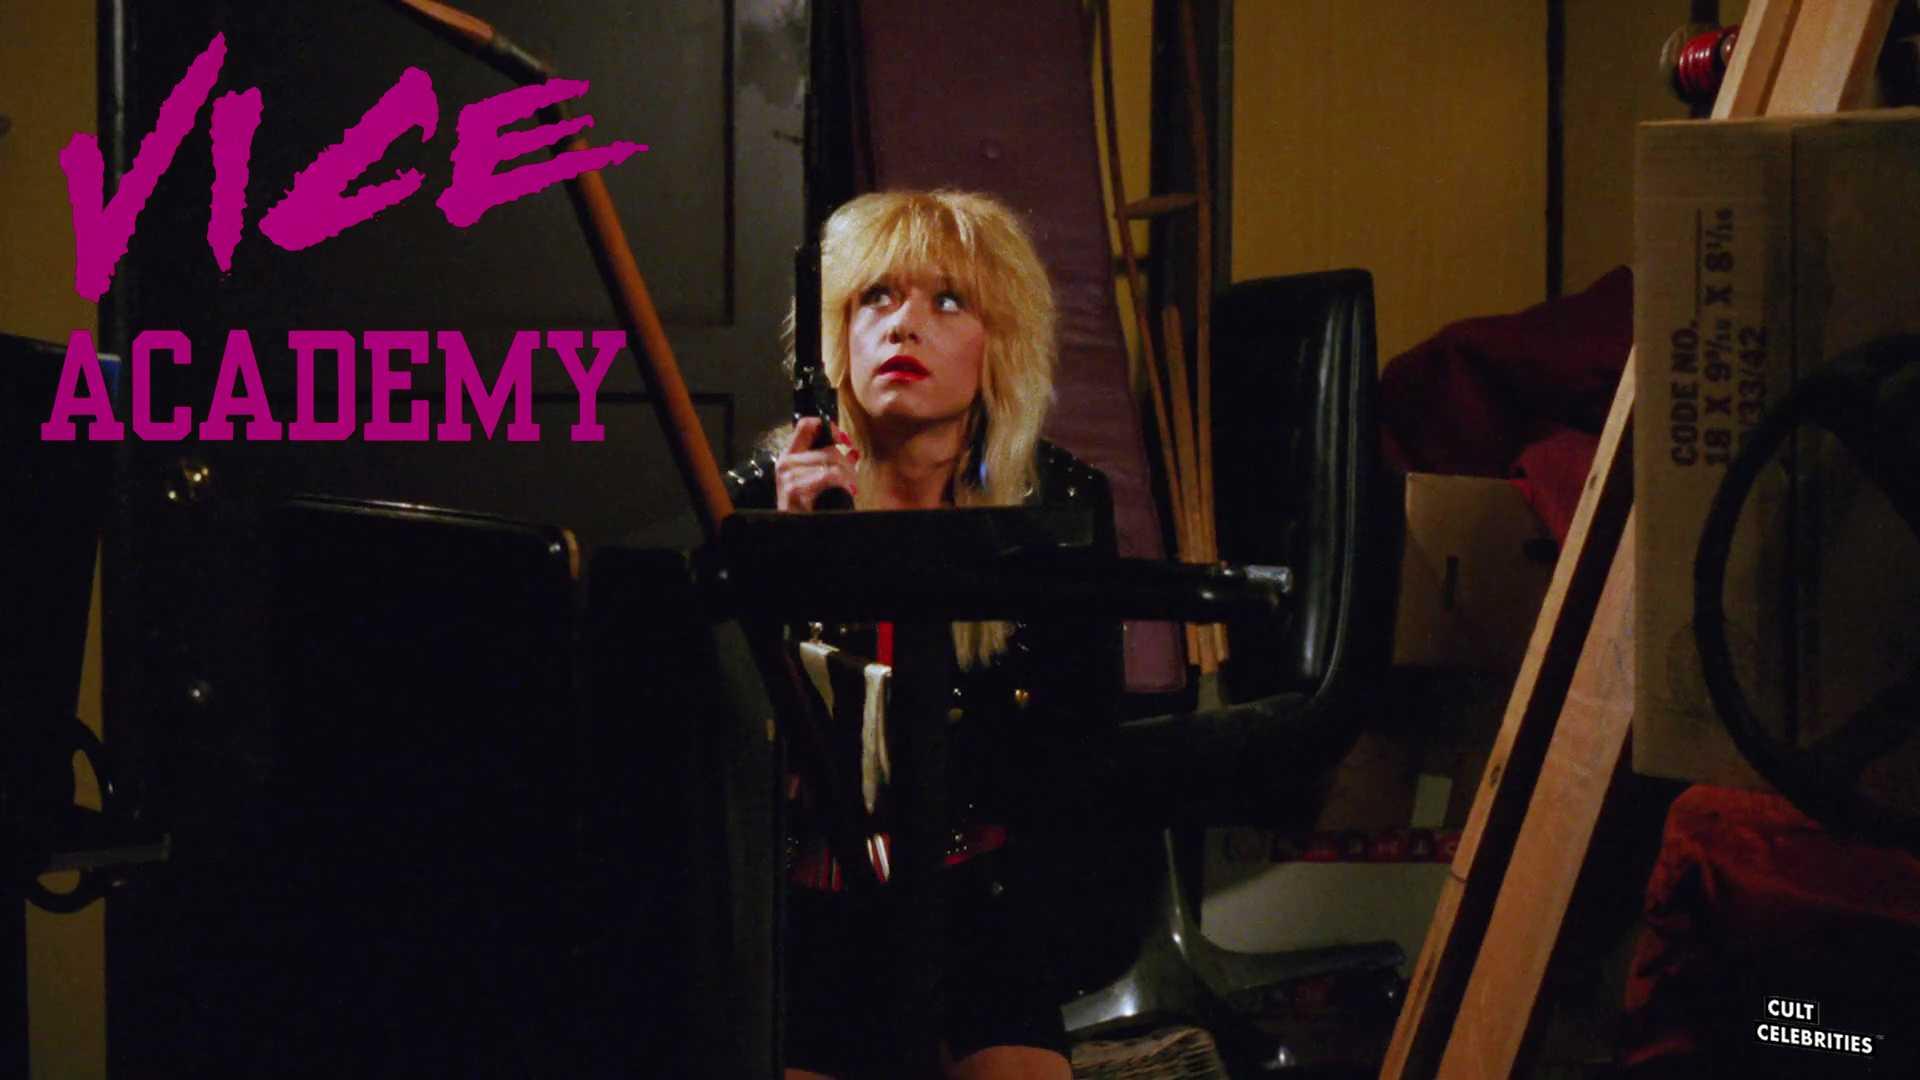 Linnea Quigley in Vice Academy (1989)